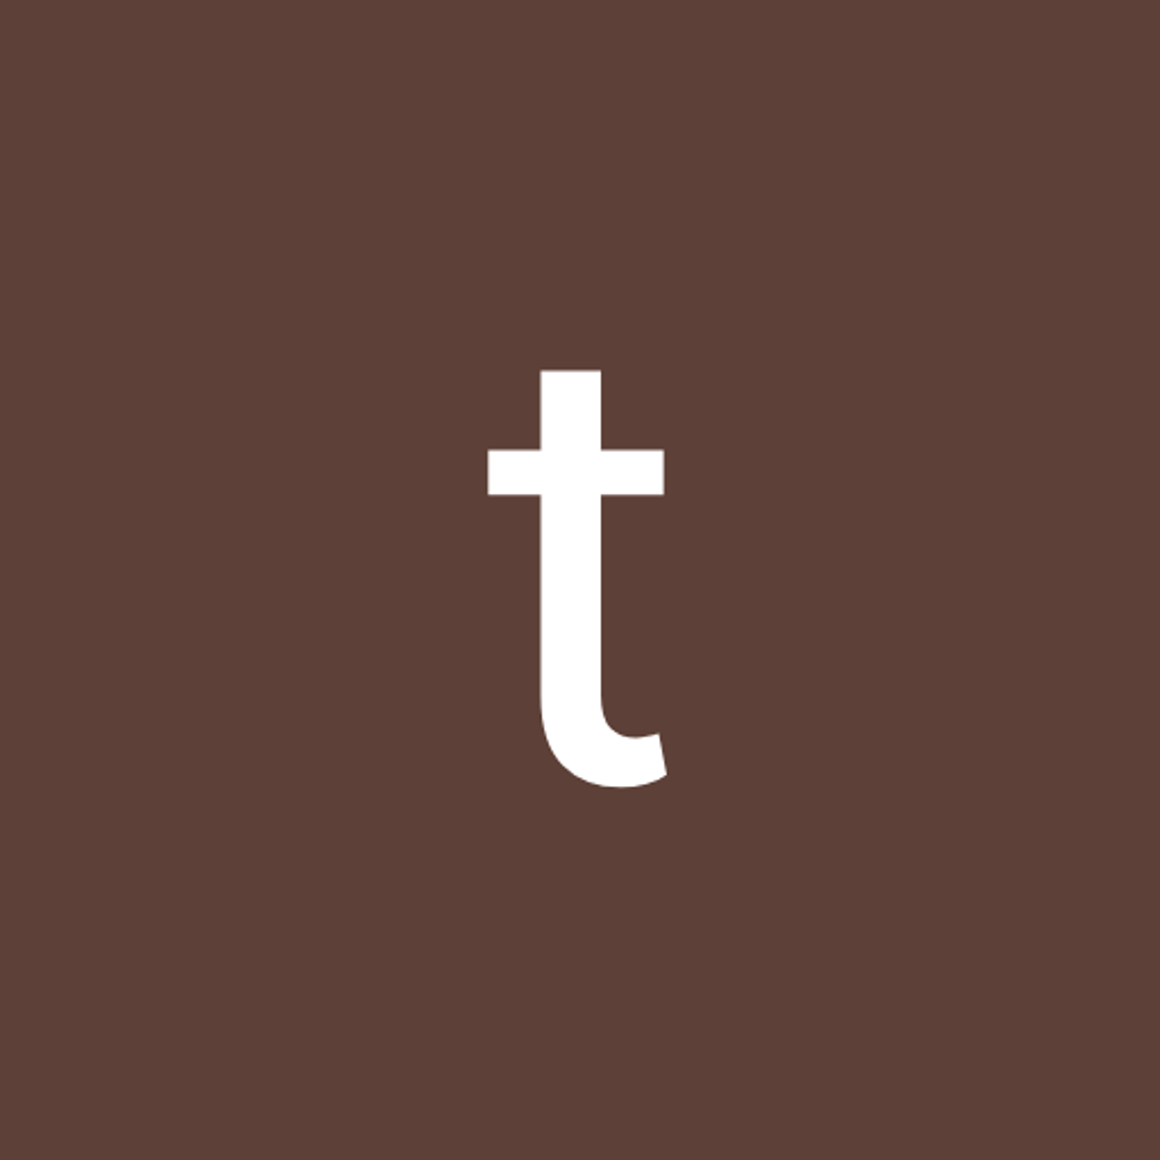 towrin tuly